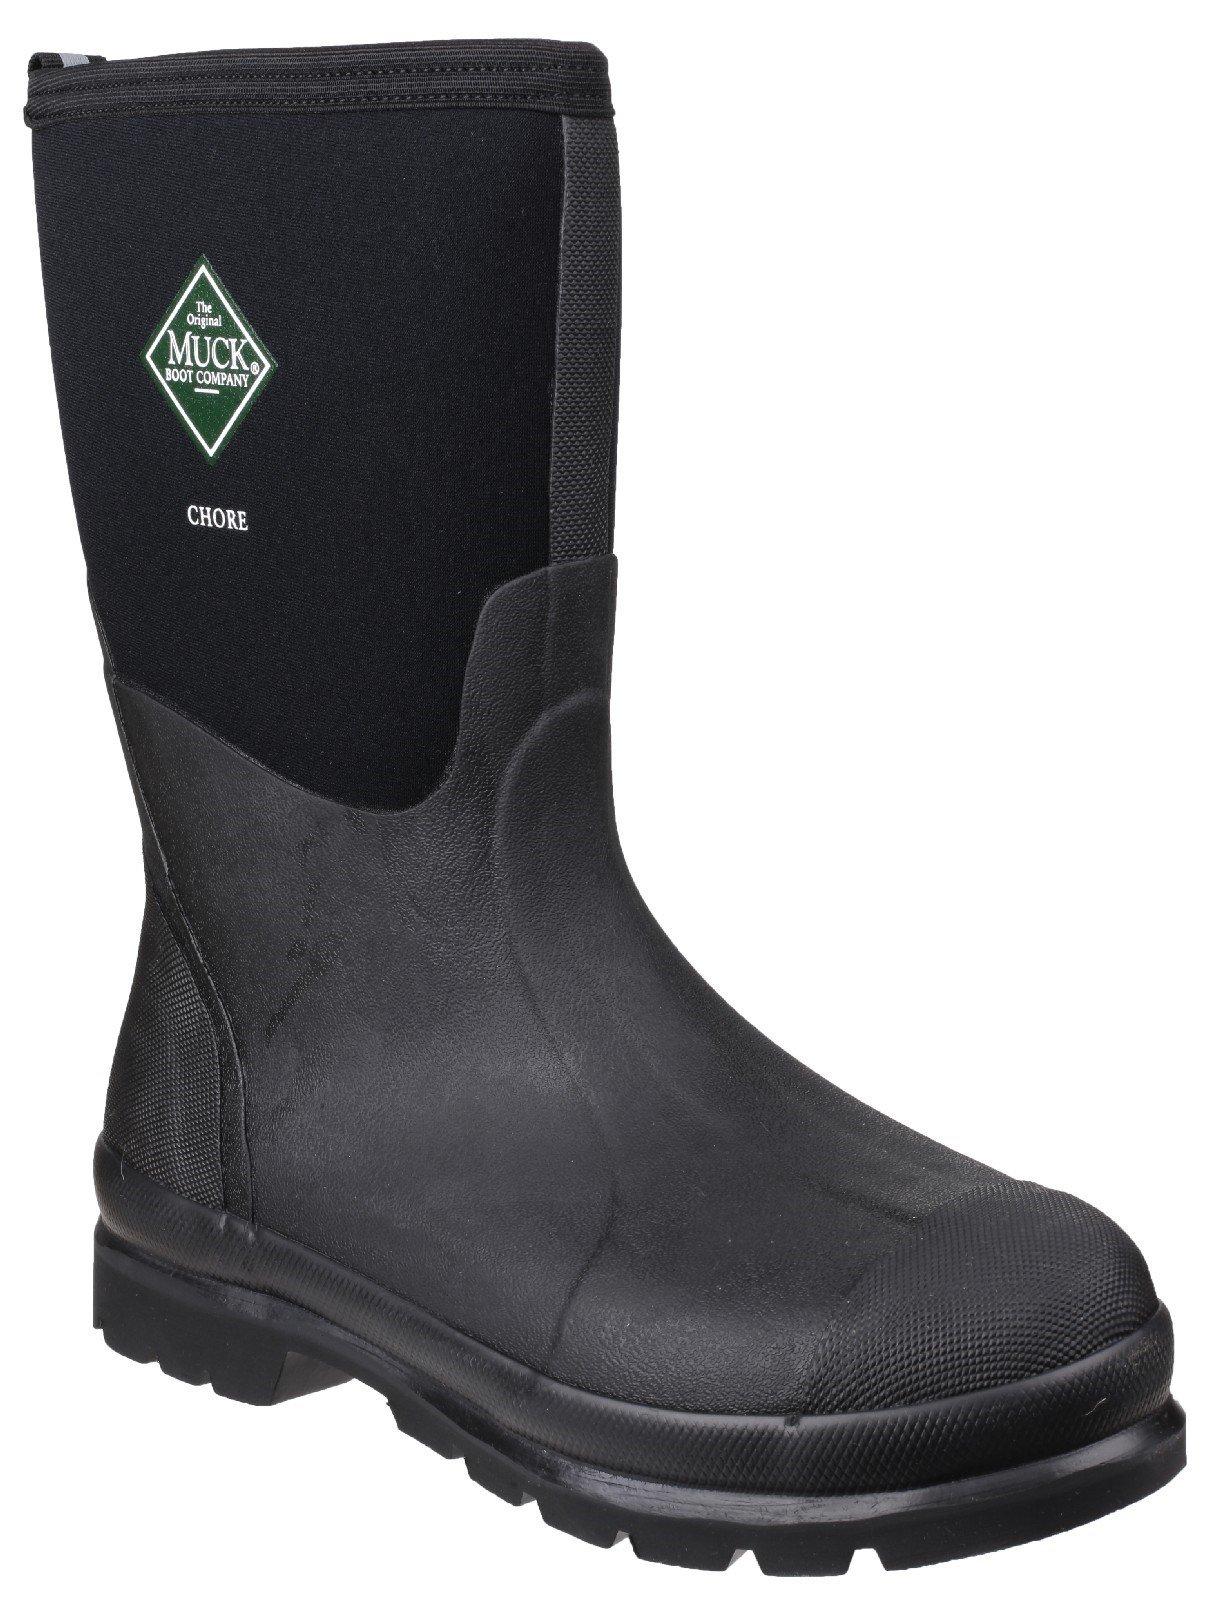 Muck Boots Unisex Chore Classic Mid Patterned Wellington Boot Black 23383 - Black 4